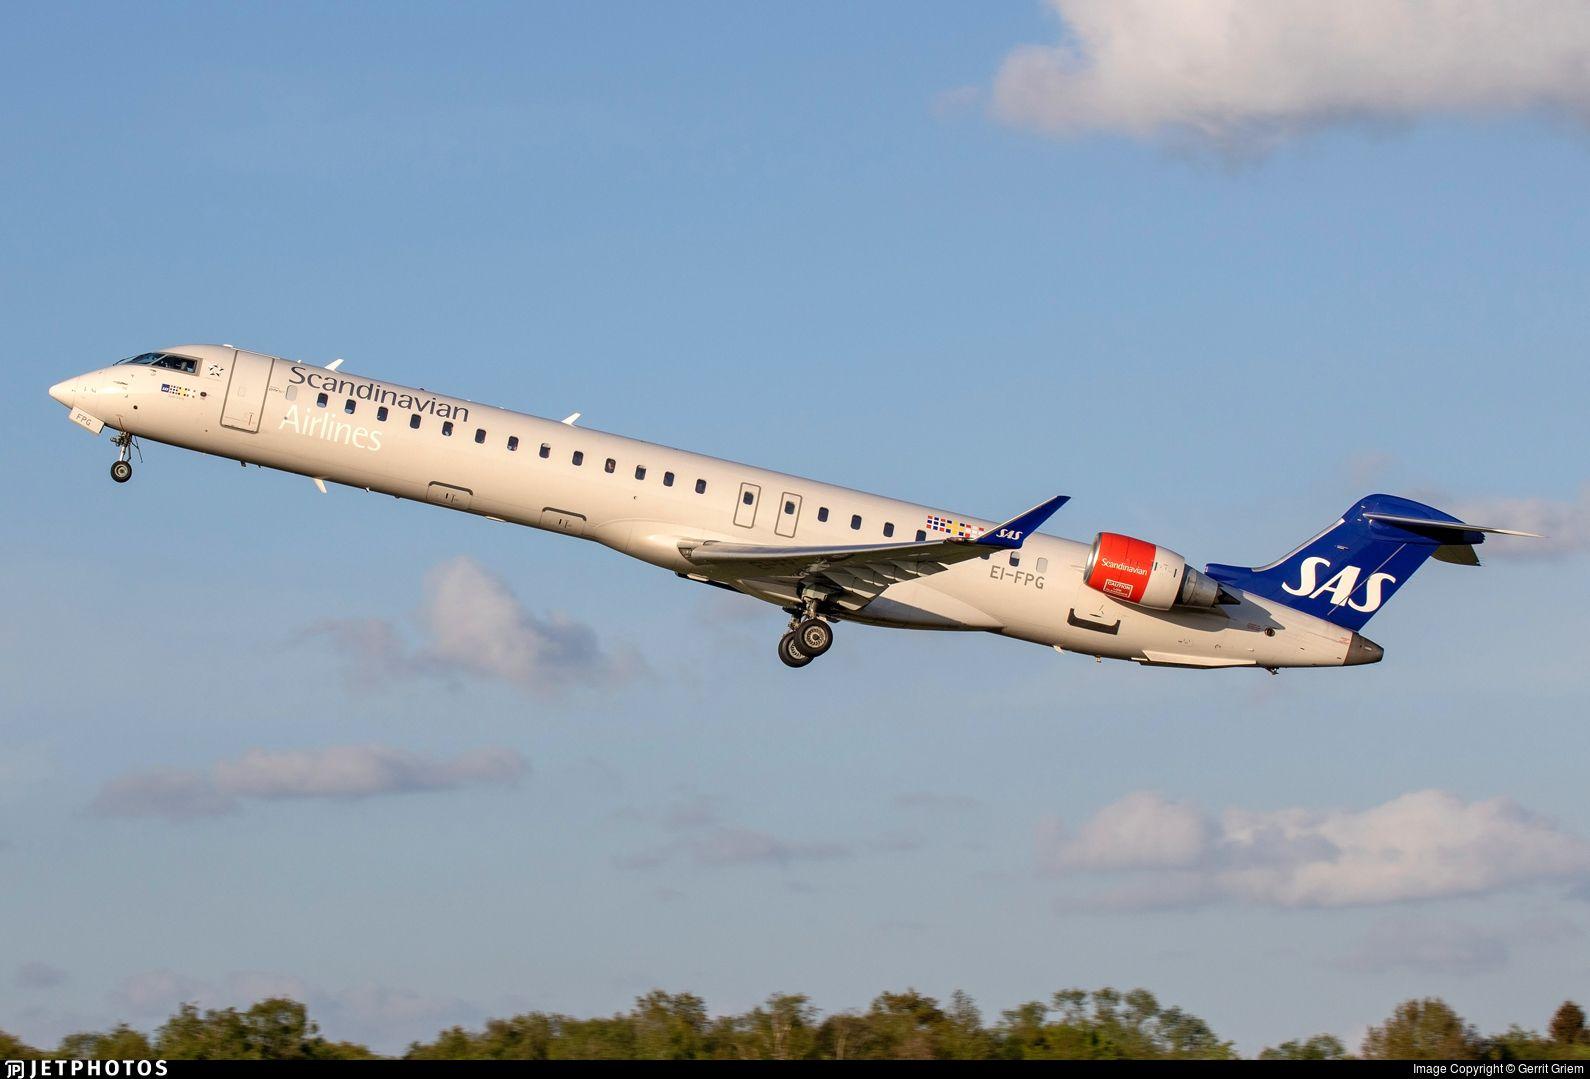 Ei Fpg In 2020 Aircraft Modeling Flight Deck Aircraft